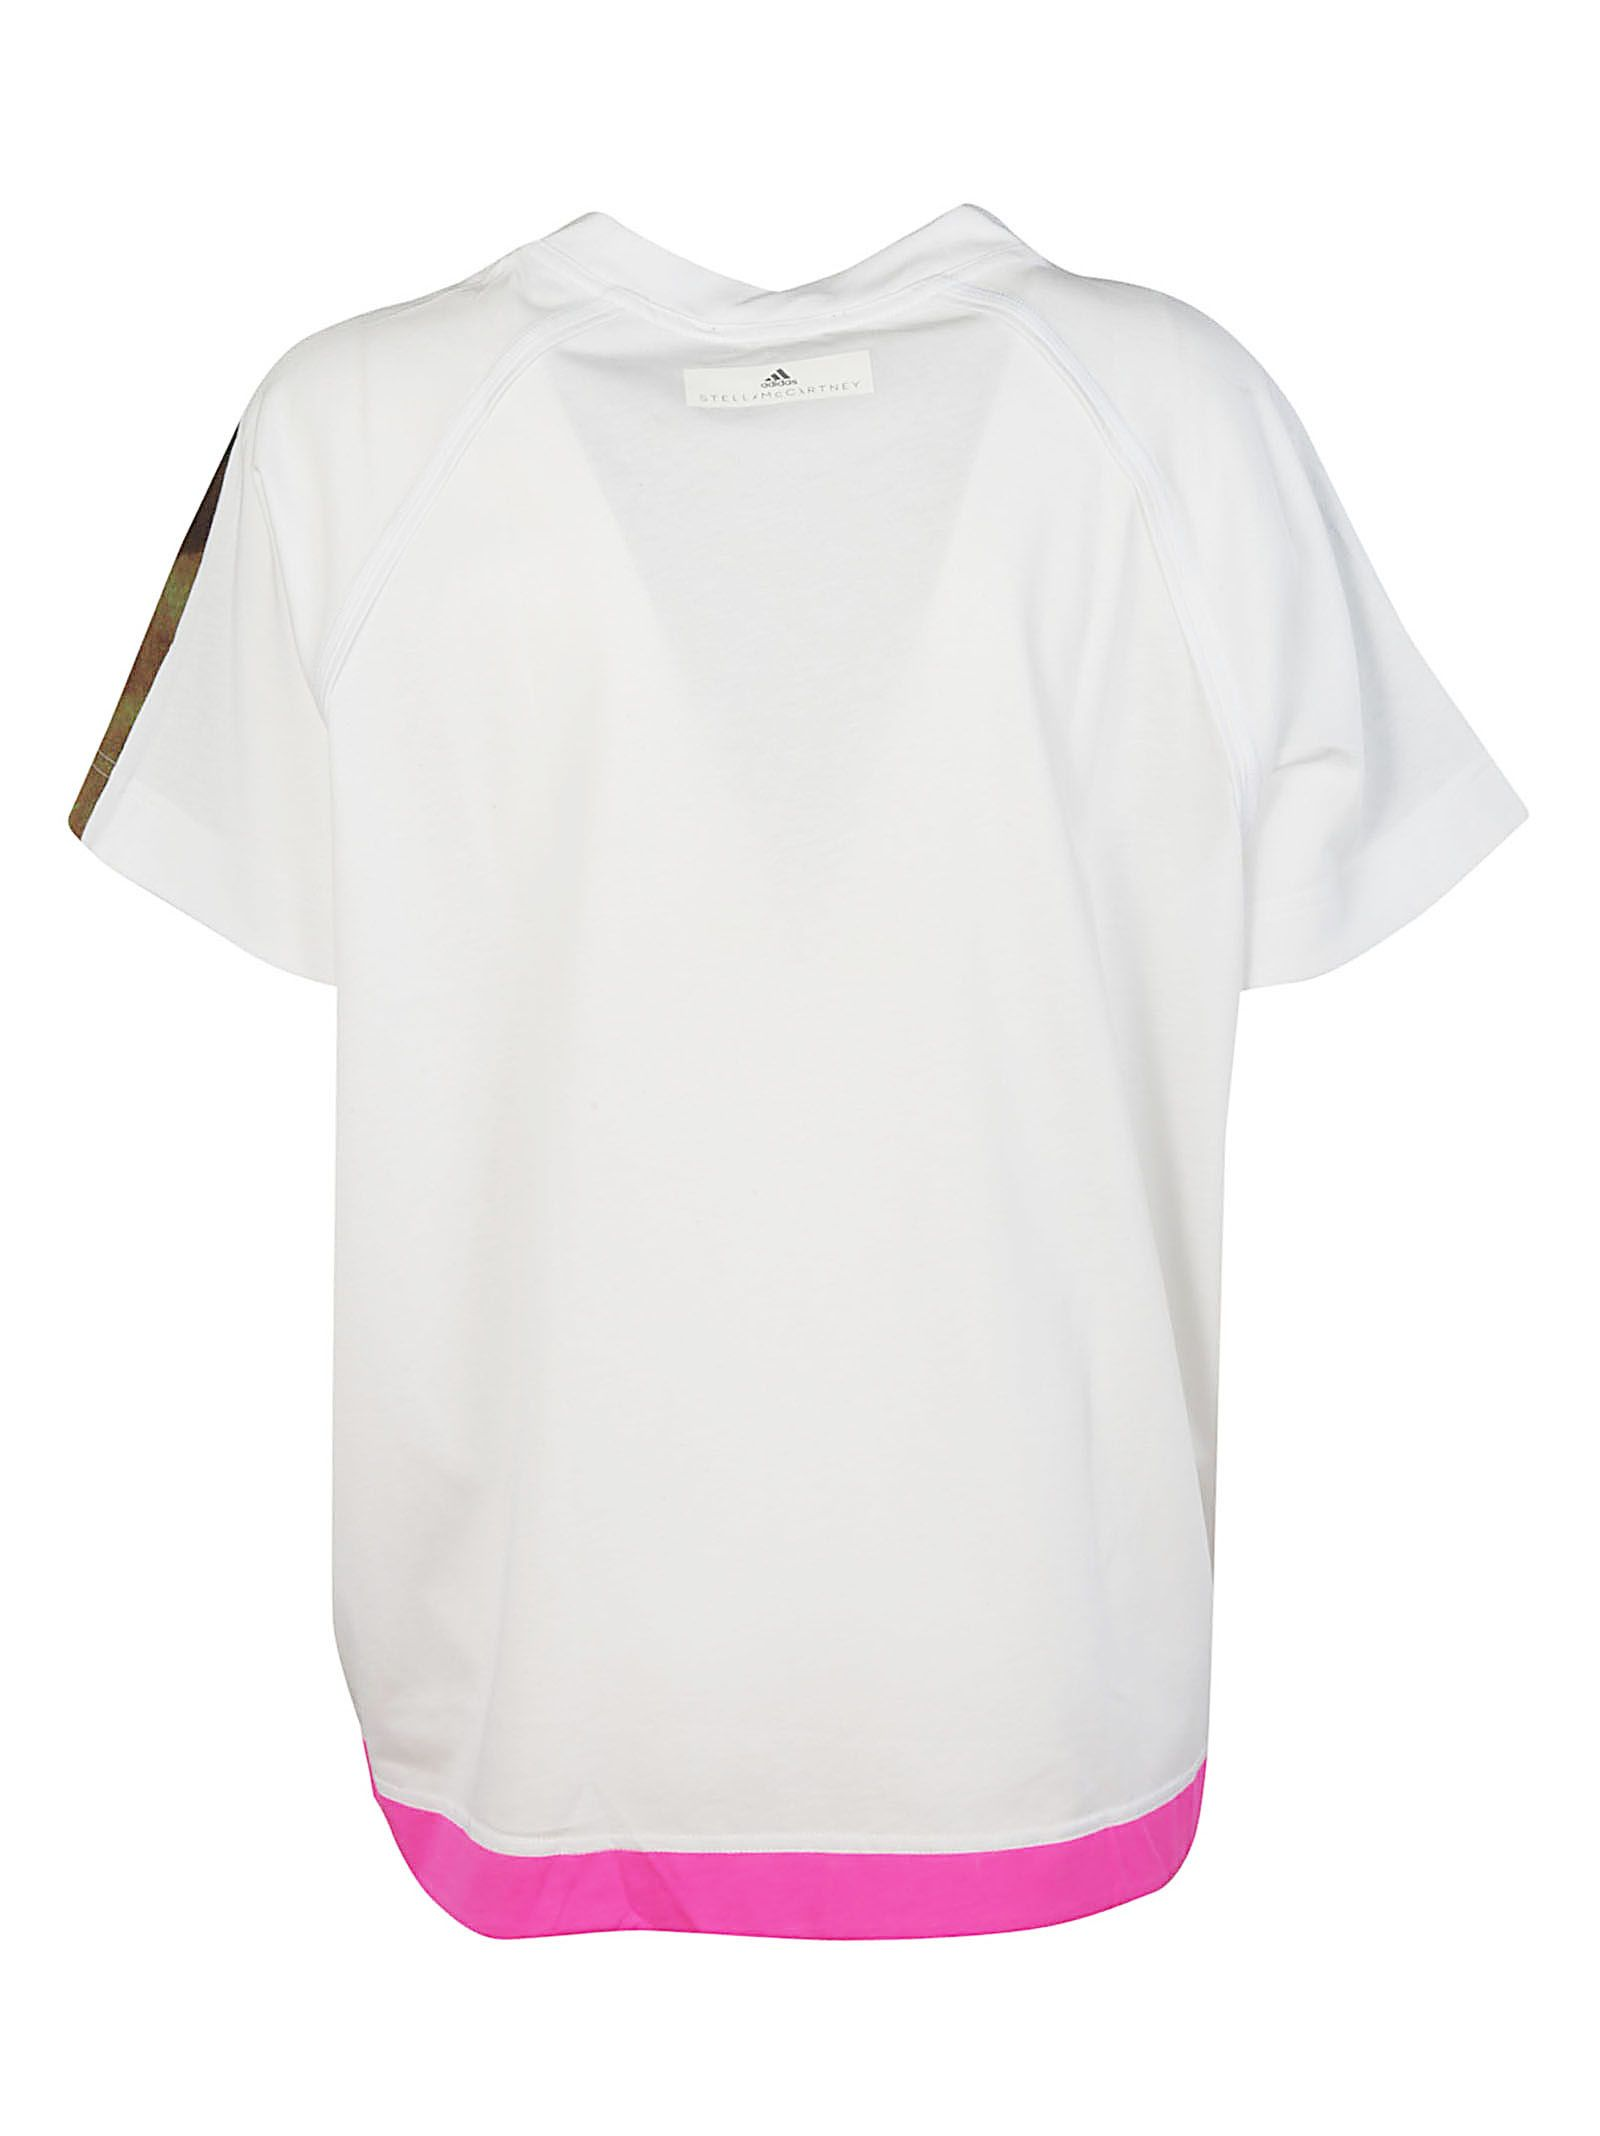 TOPWEAR - T-shirts Gazel Clearance Huge Surprise qZIHB1oGpb